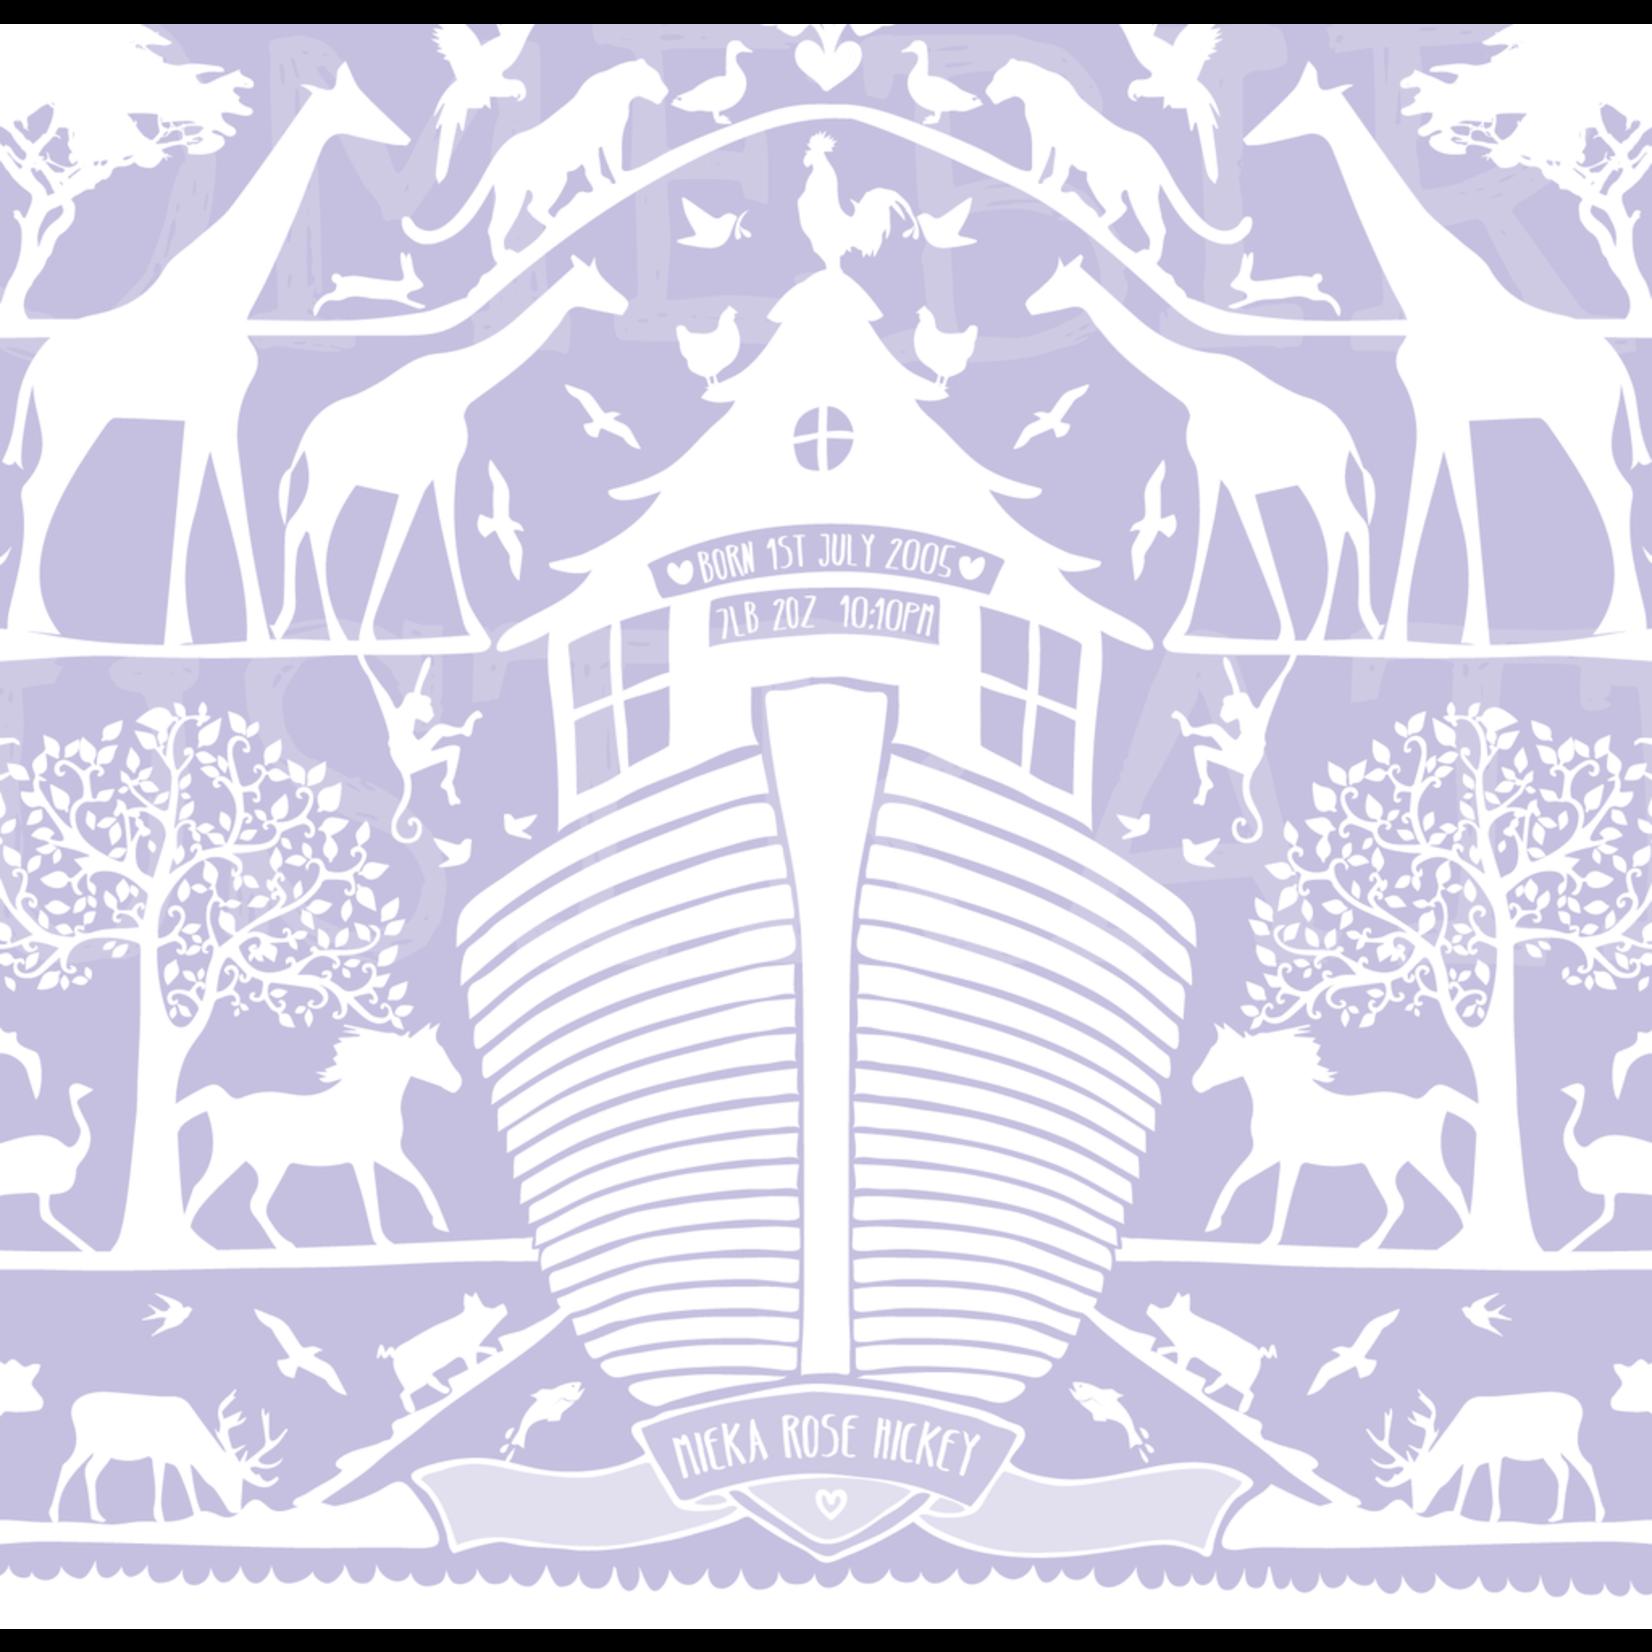 Homebird Bespoke Homebird Bespoke Noah's Ark Personalised A3 Illustration